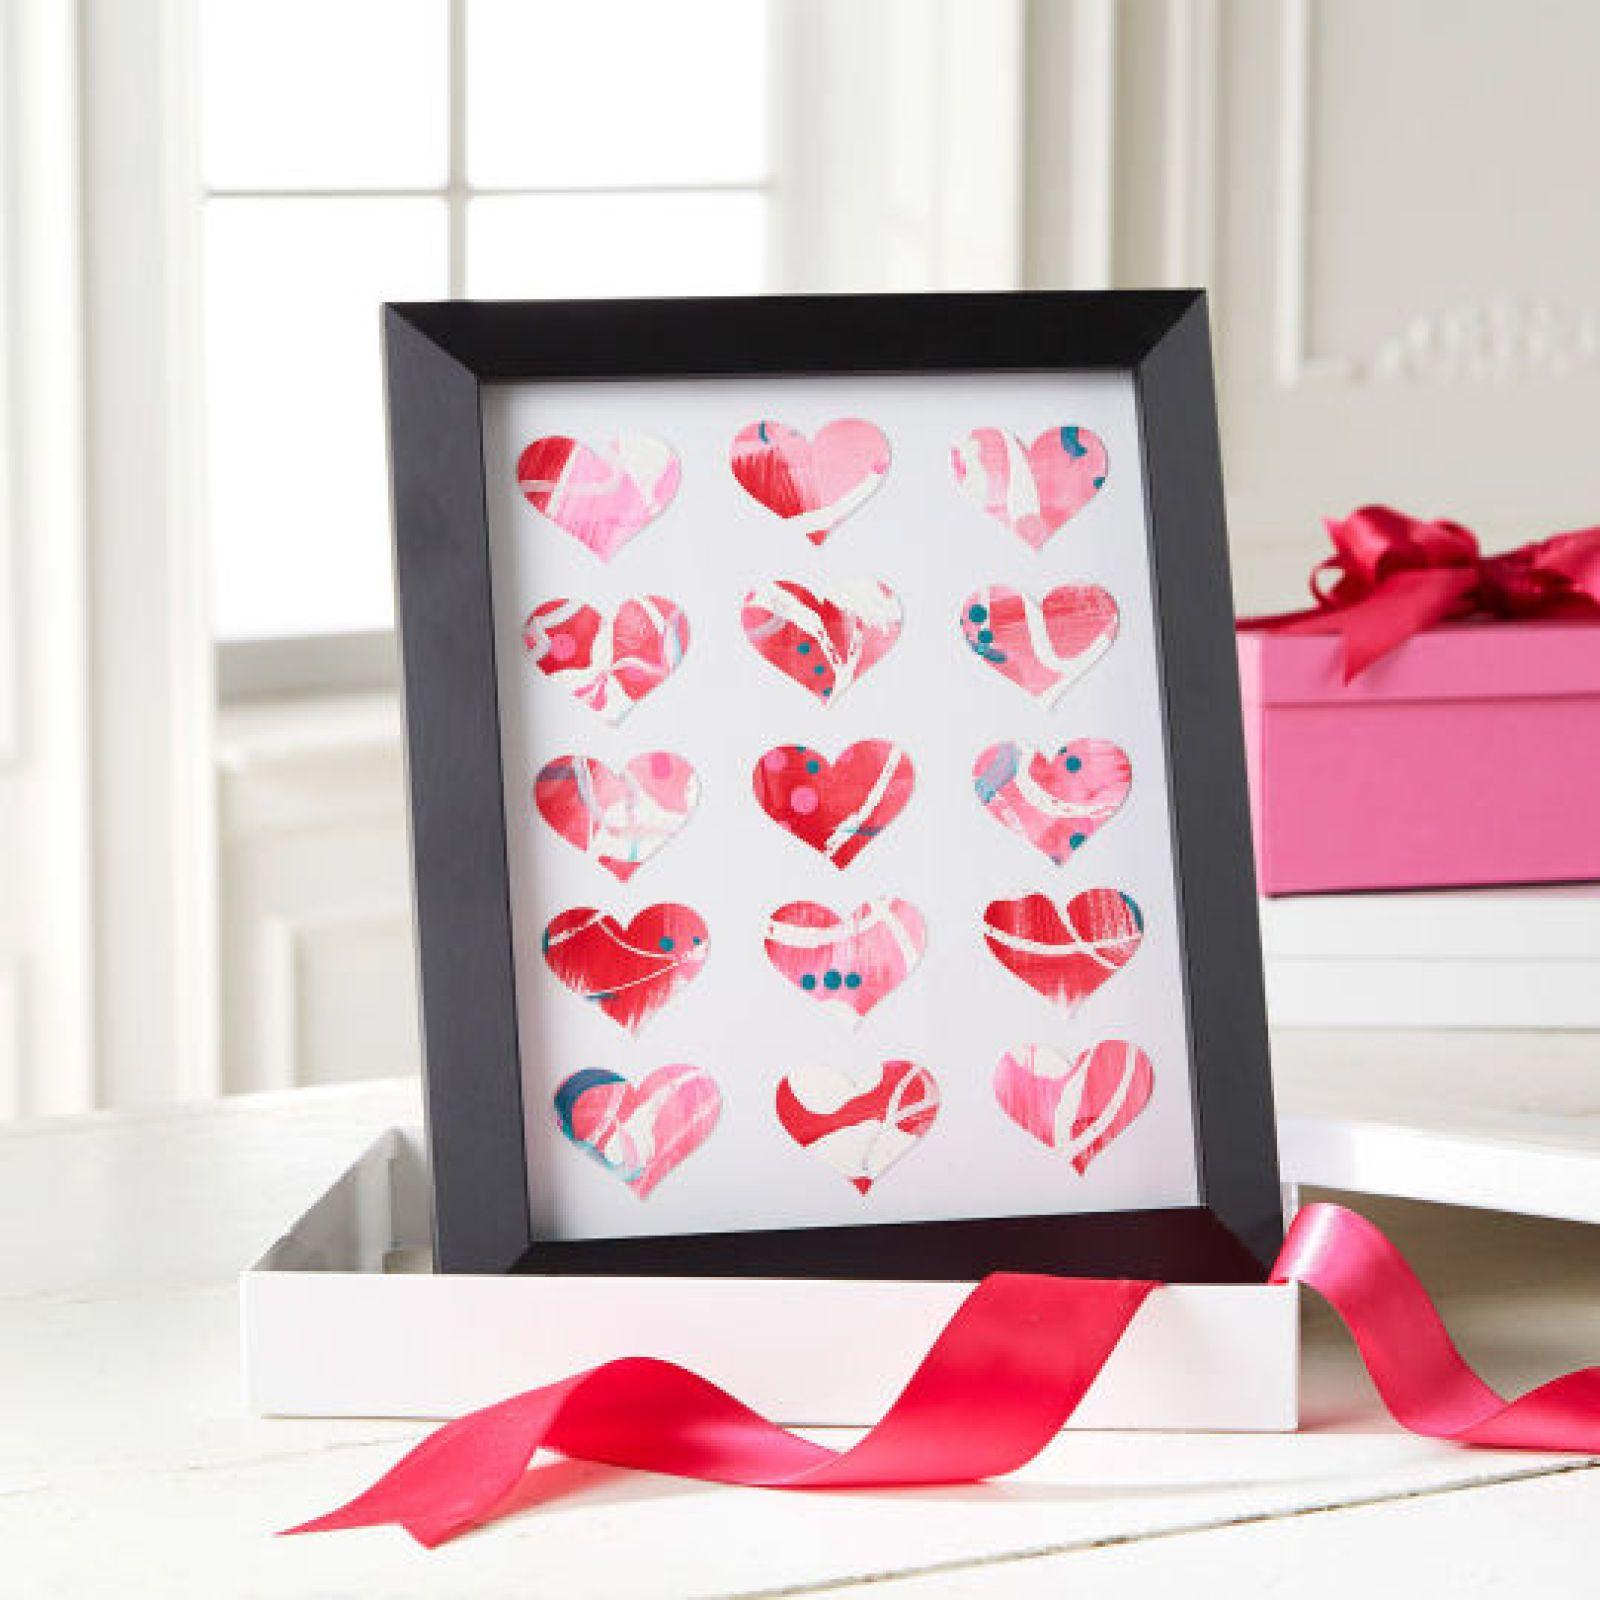 Diy Easy To Make Valentines Day Frame